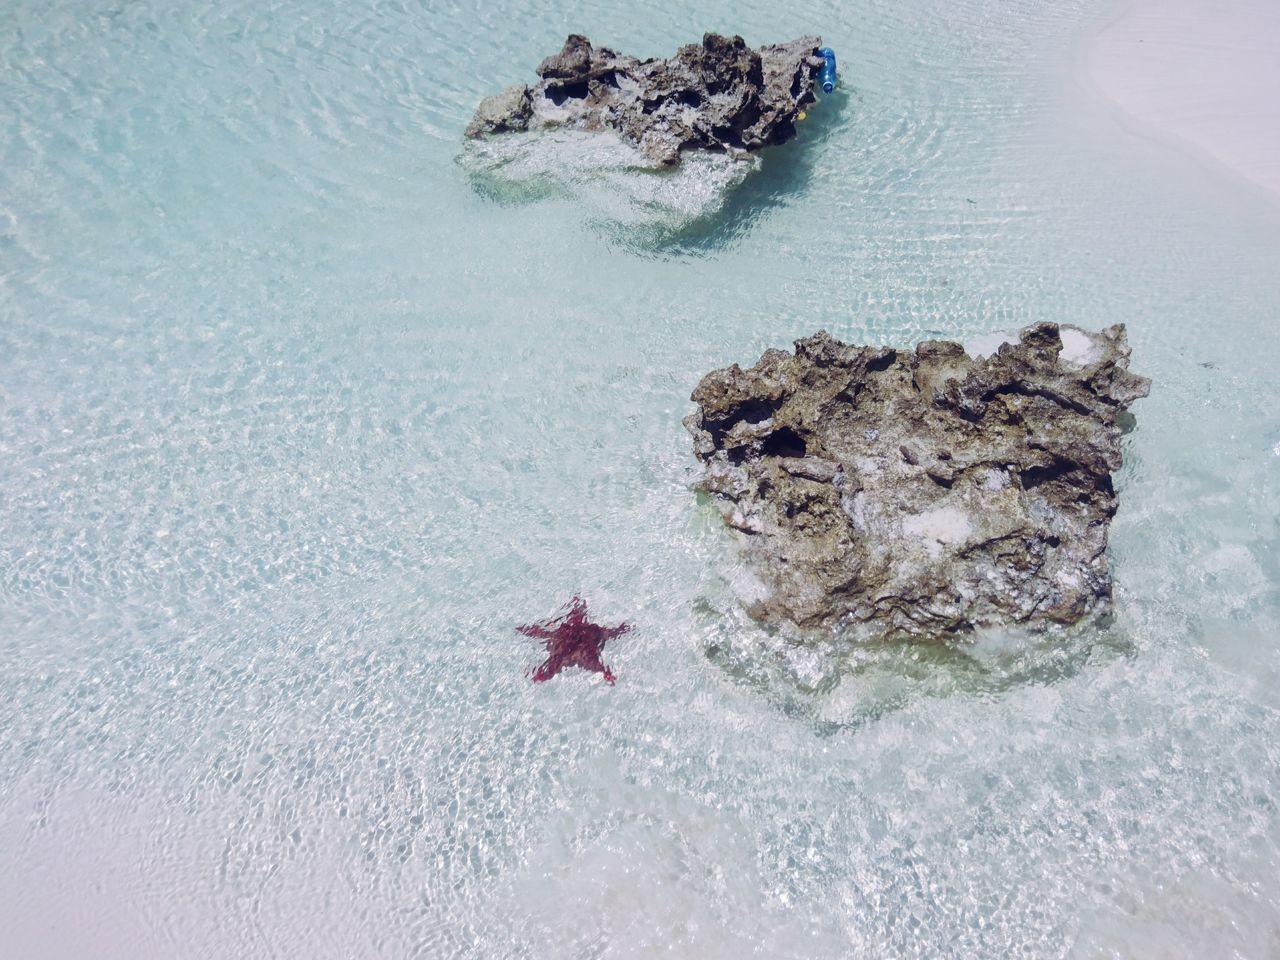 Diani Beach, Kenya. No People Nature Beauty In Nature Sea Life Indian Ocean Minimal VSCO EyeEm Best Edits EyeEm Best Shots Travel Destinations Travel LandscapeWater Beach Diani Beach Starfish  Starfish At Beach Adventure Africa Kenya Ocean